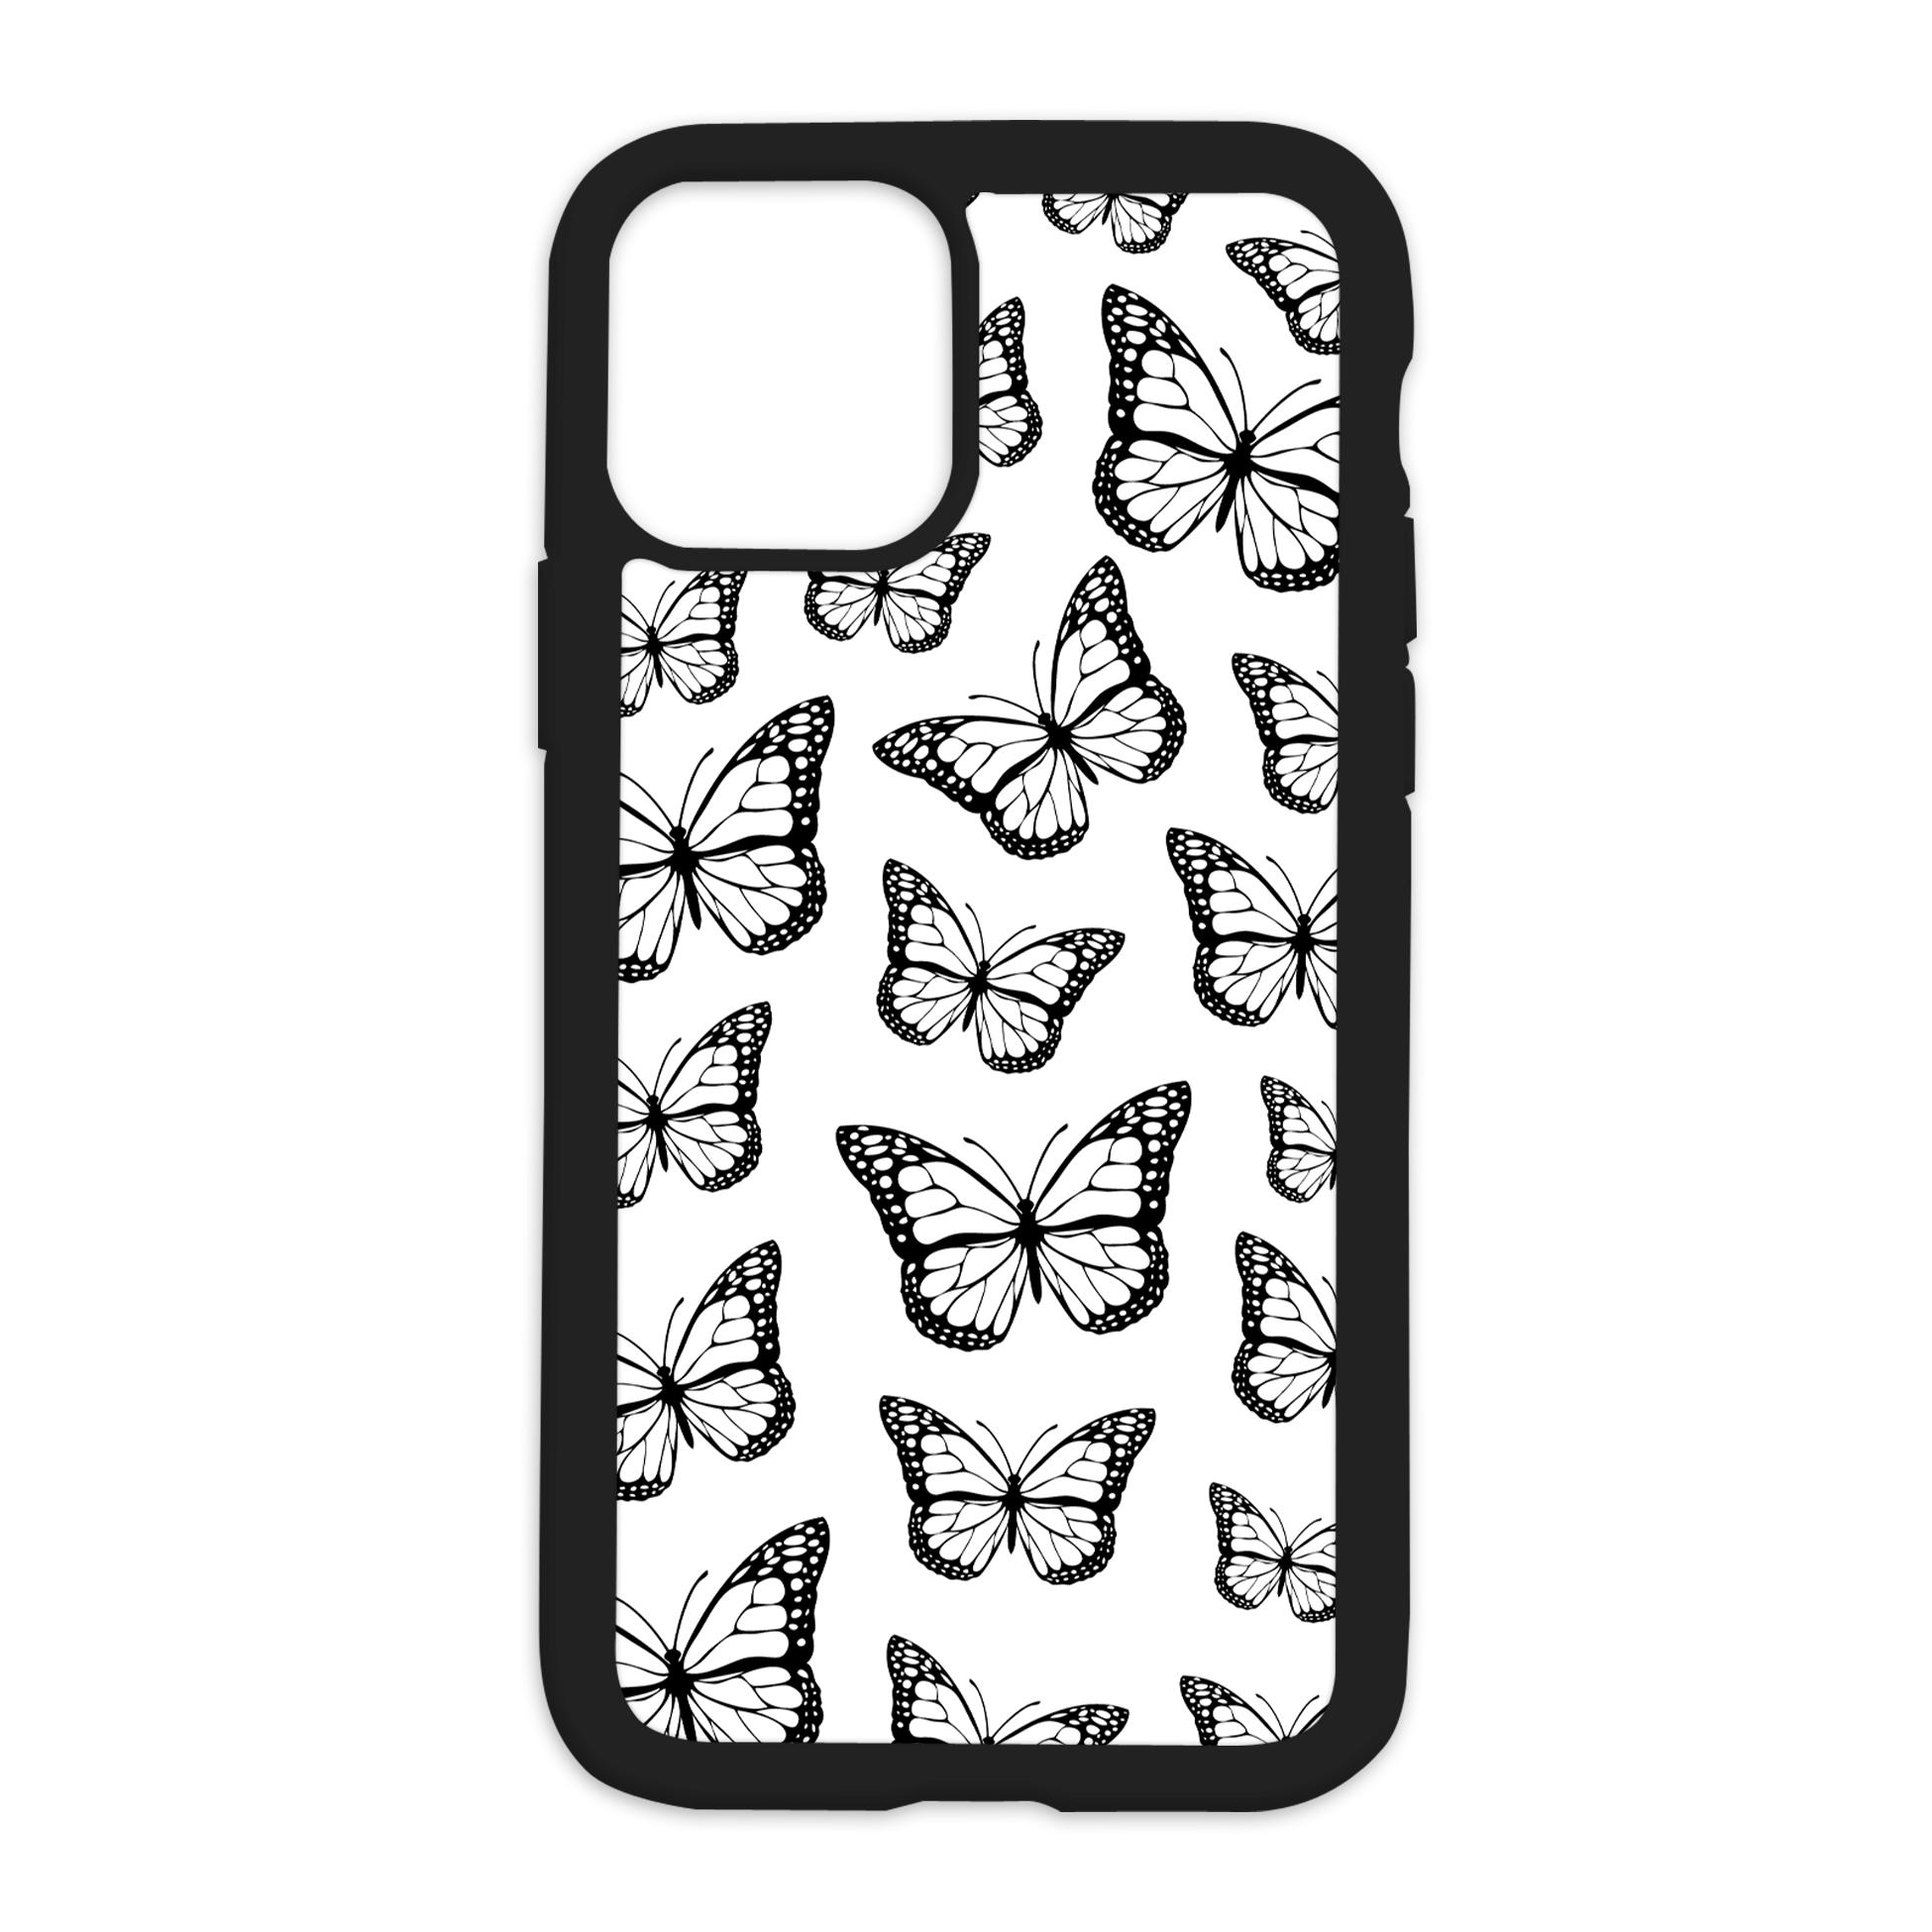 Black Butterfly Design On Black Phone Case - 11